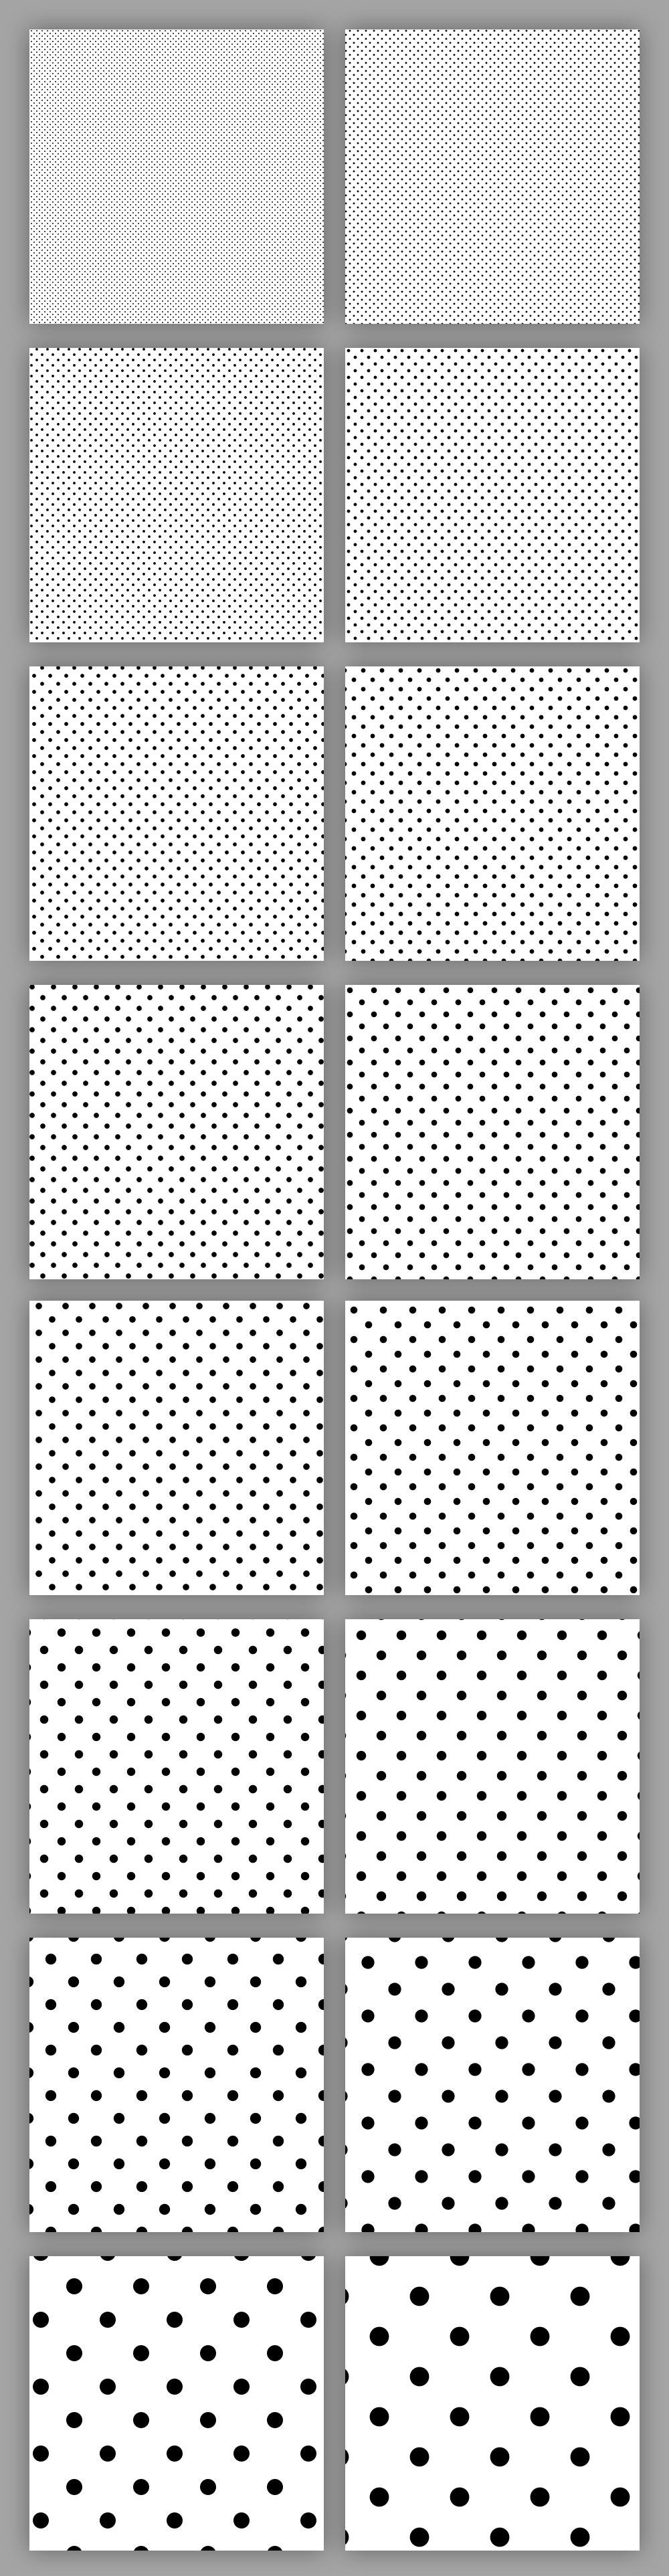 halftone-patterns